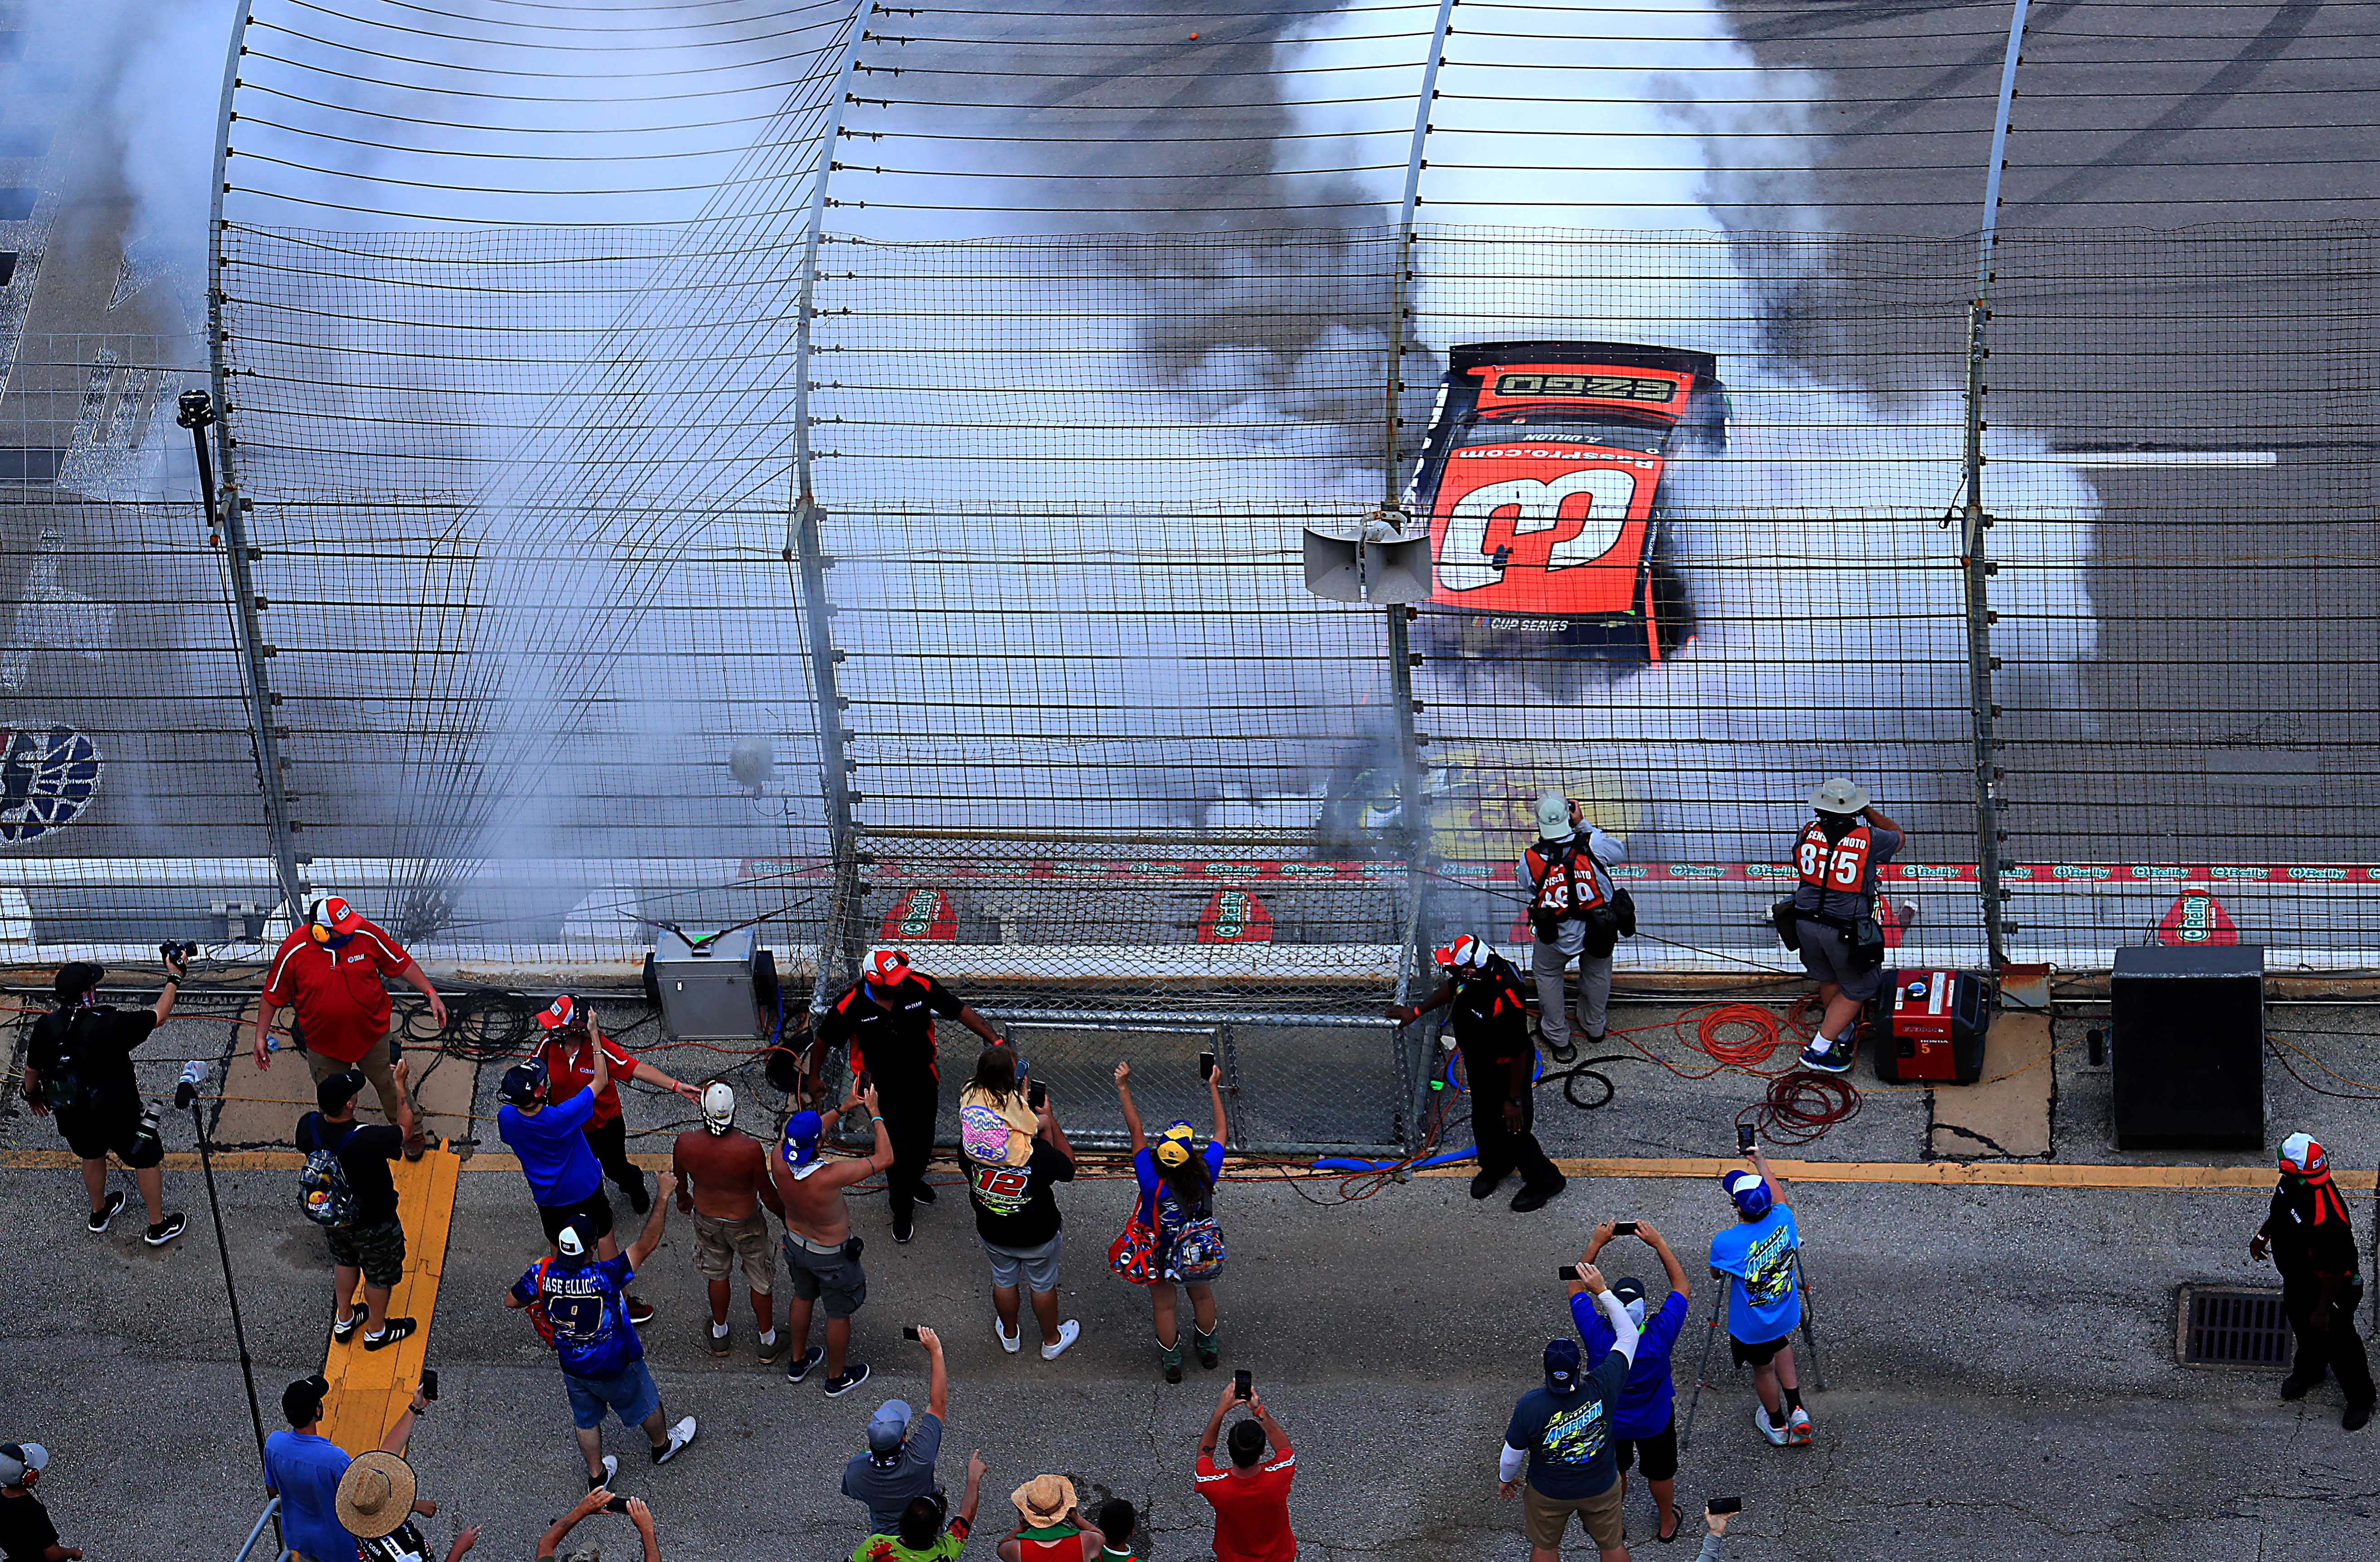 Austin Dillon wins at Texas Motor Speedway - NASCAR Cup Series fans